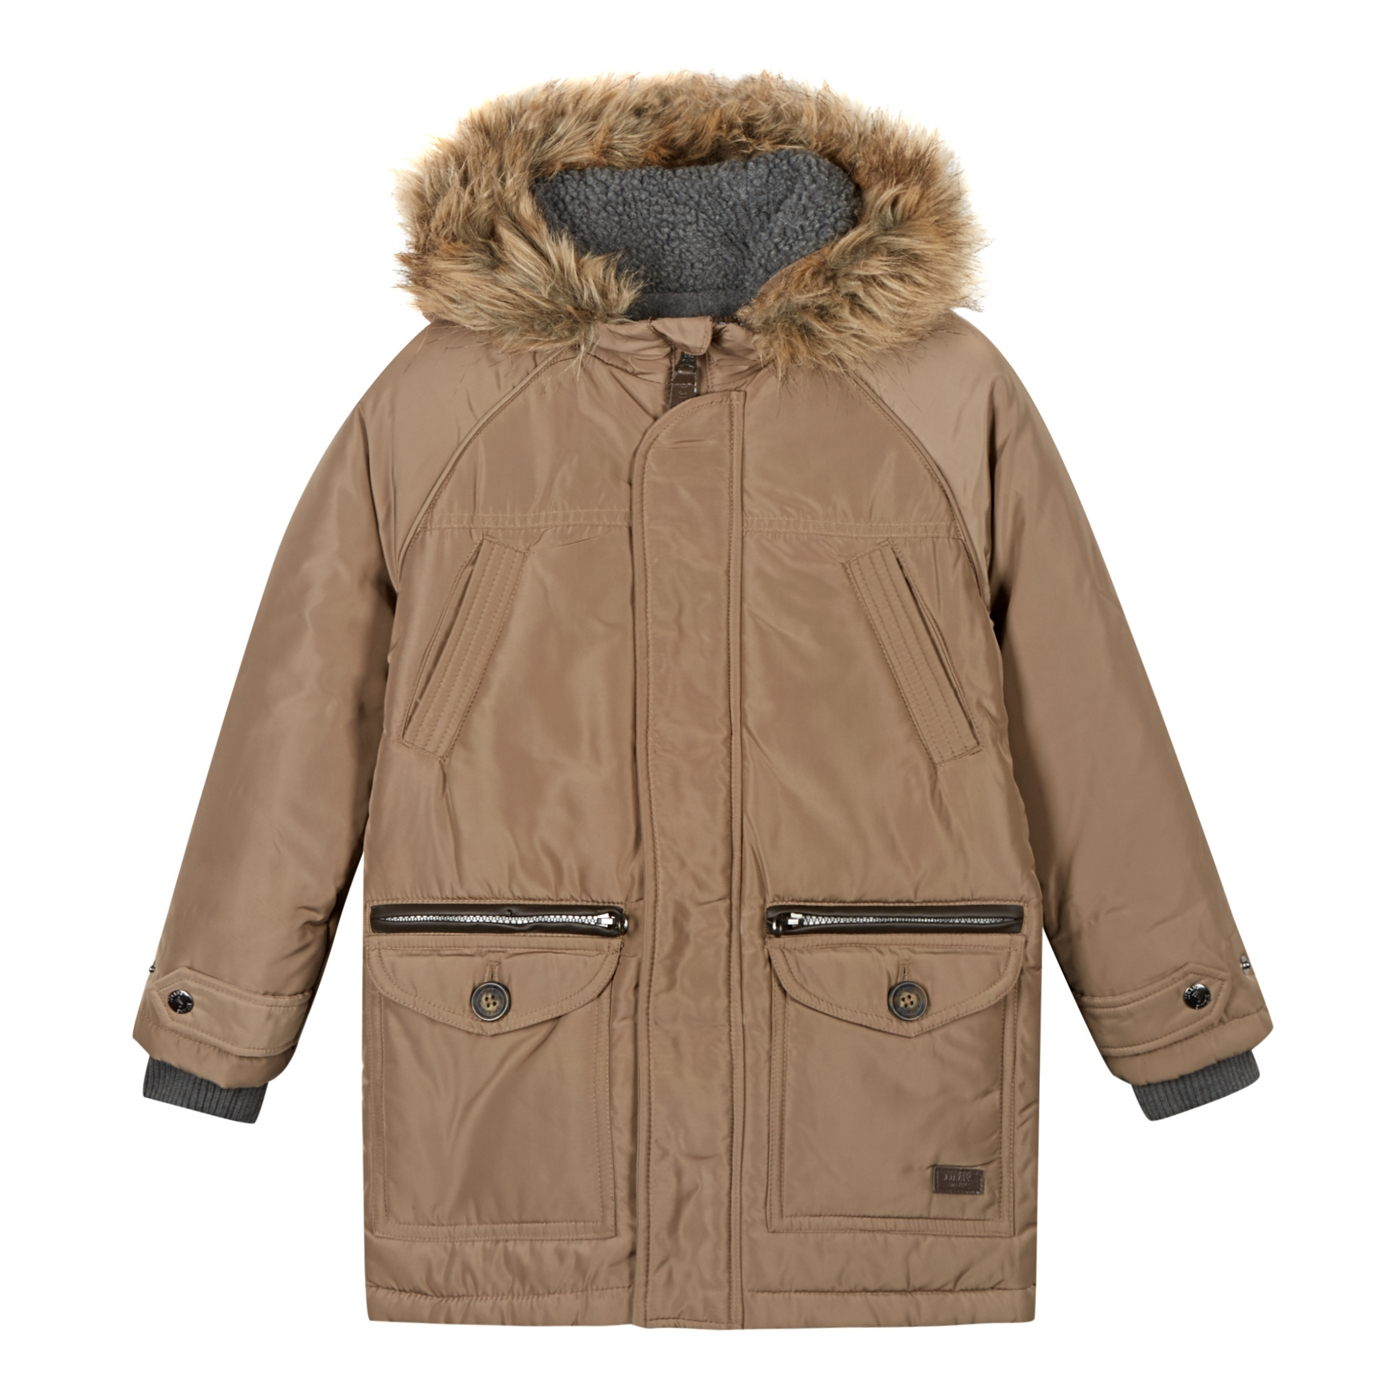 a9634827b J by Jasper Conran Designer boys beige faux fur trimmed hood parka coat